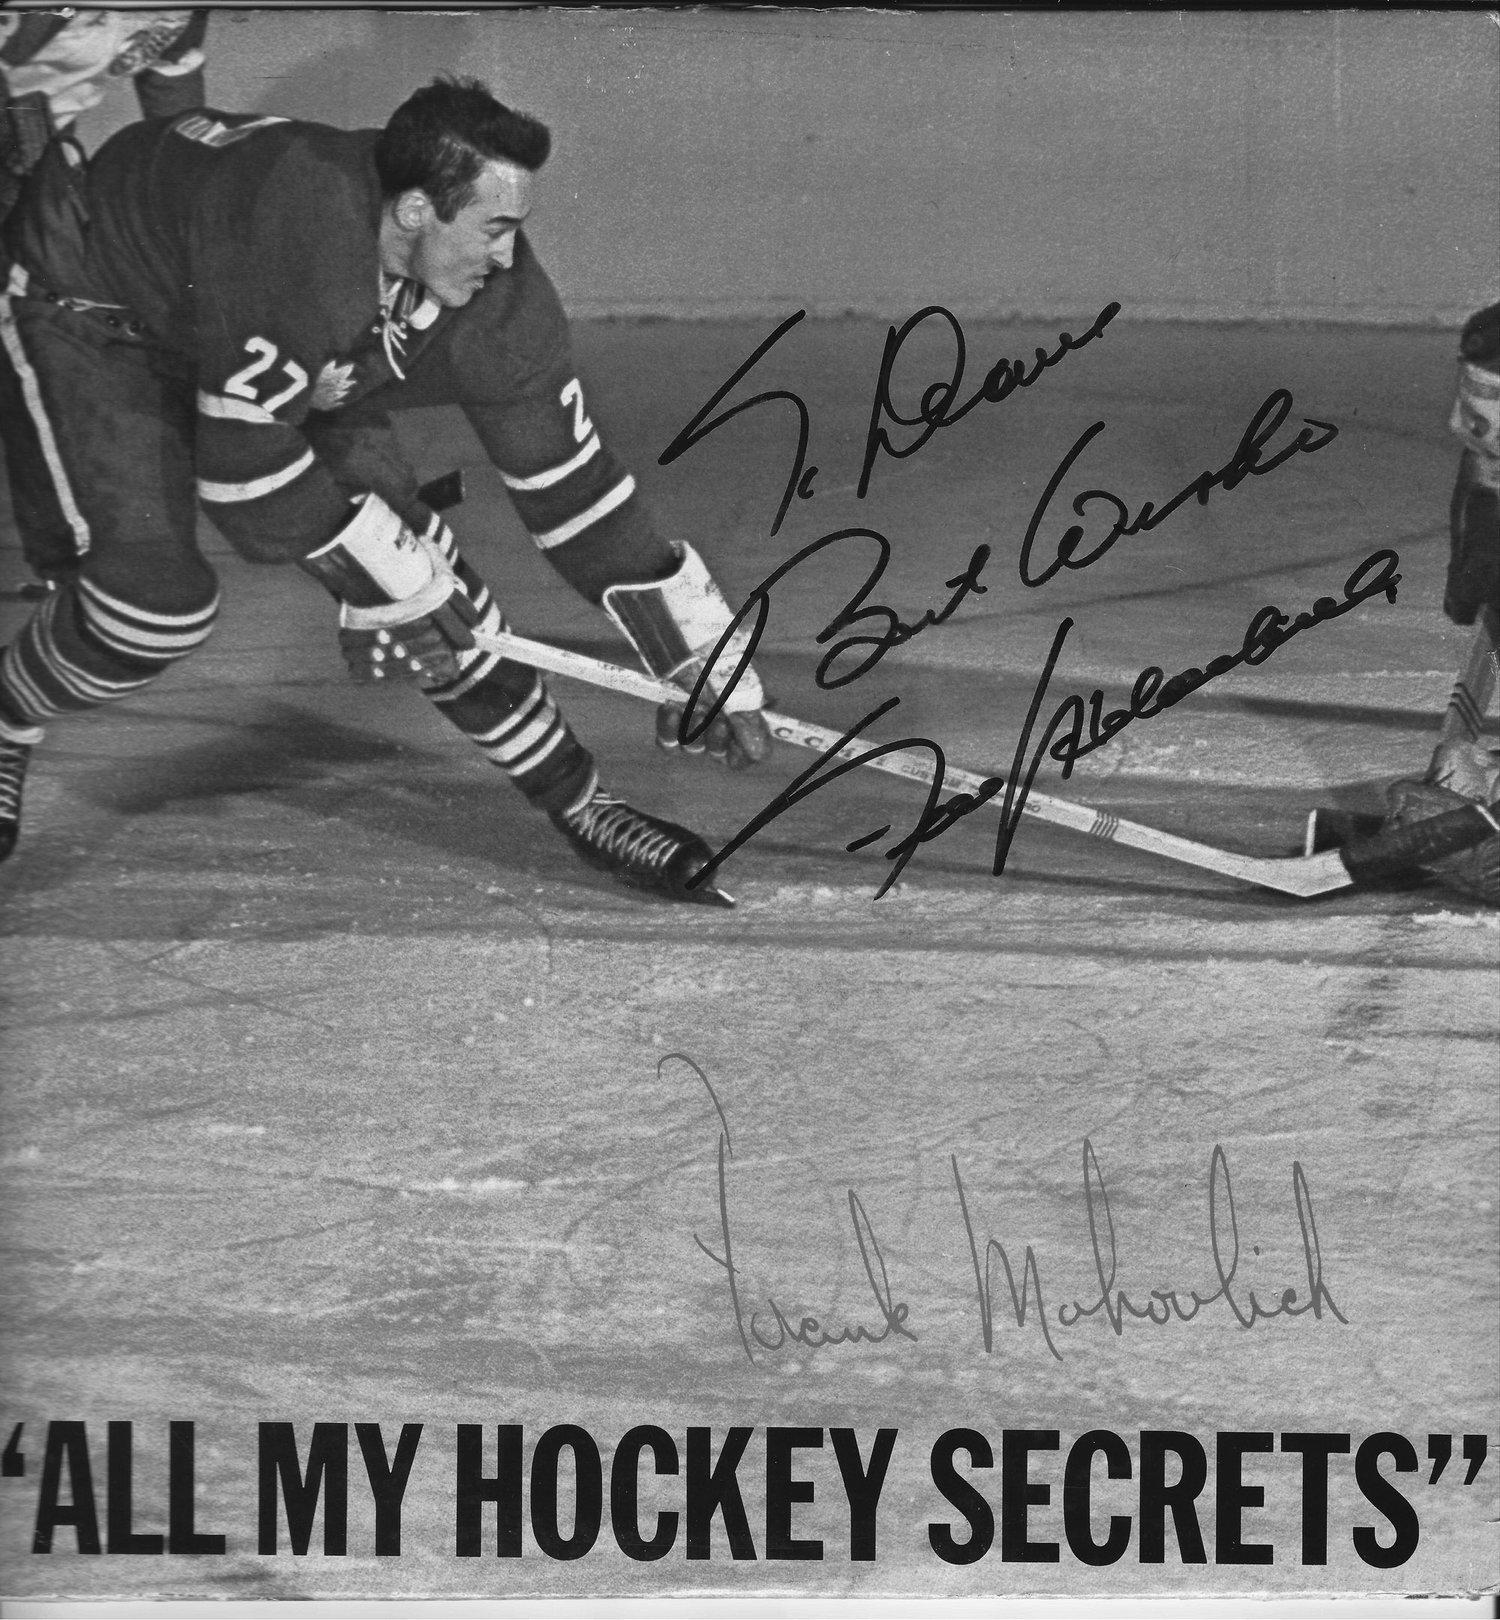 All My Hockey Secrets